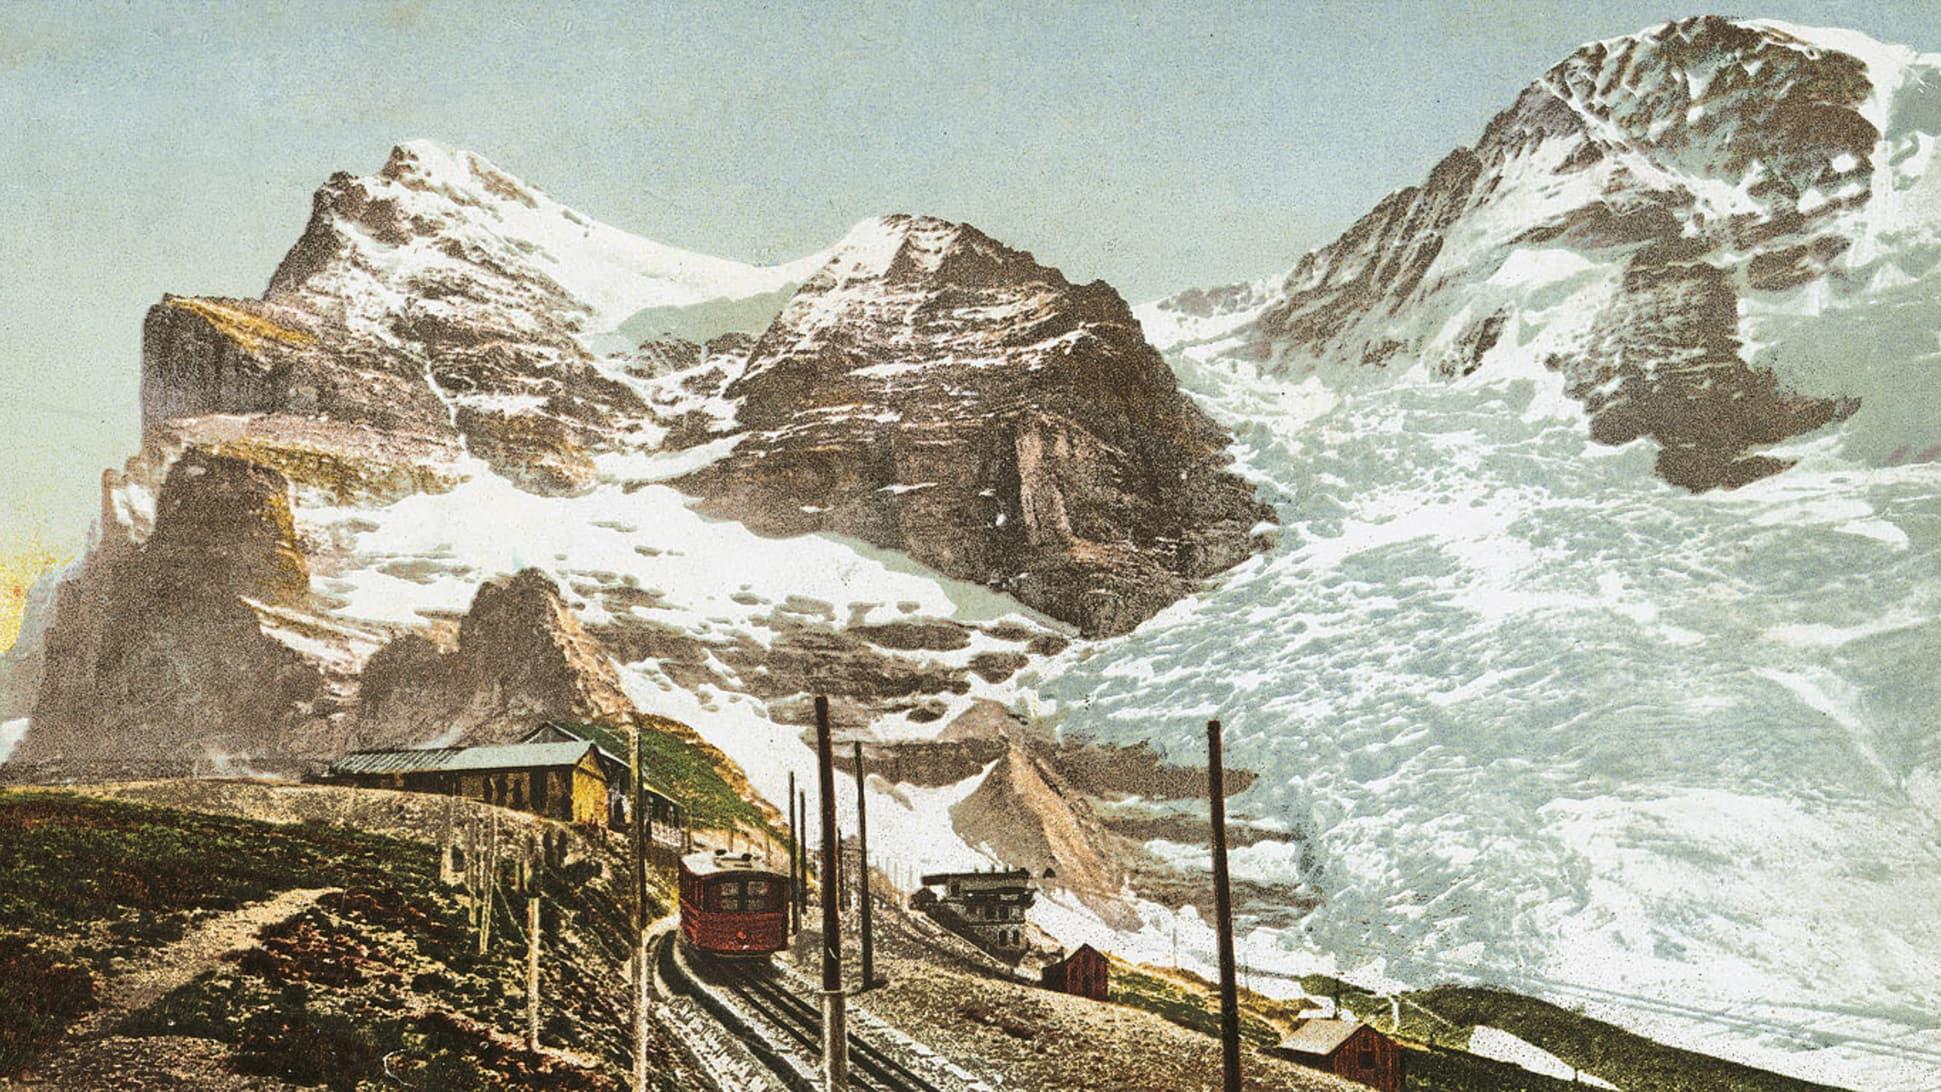 Bau der Jungfraubahn33